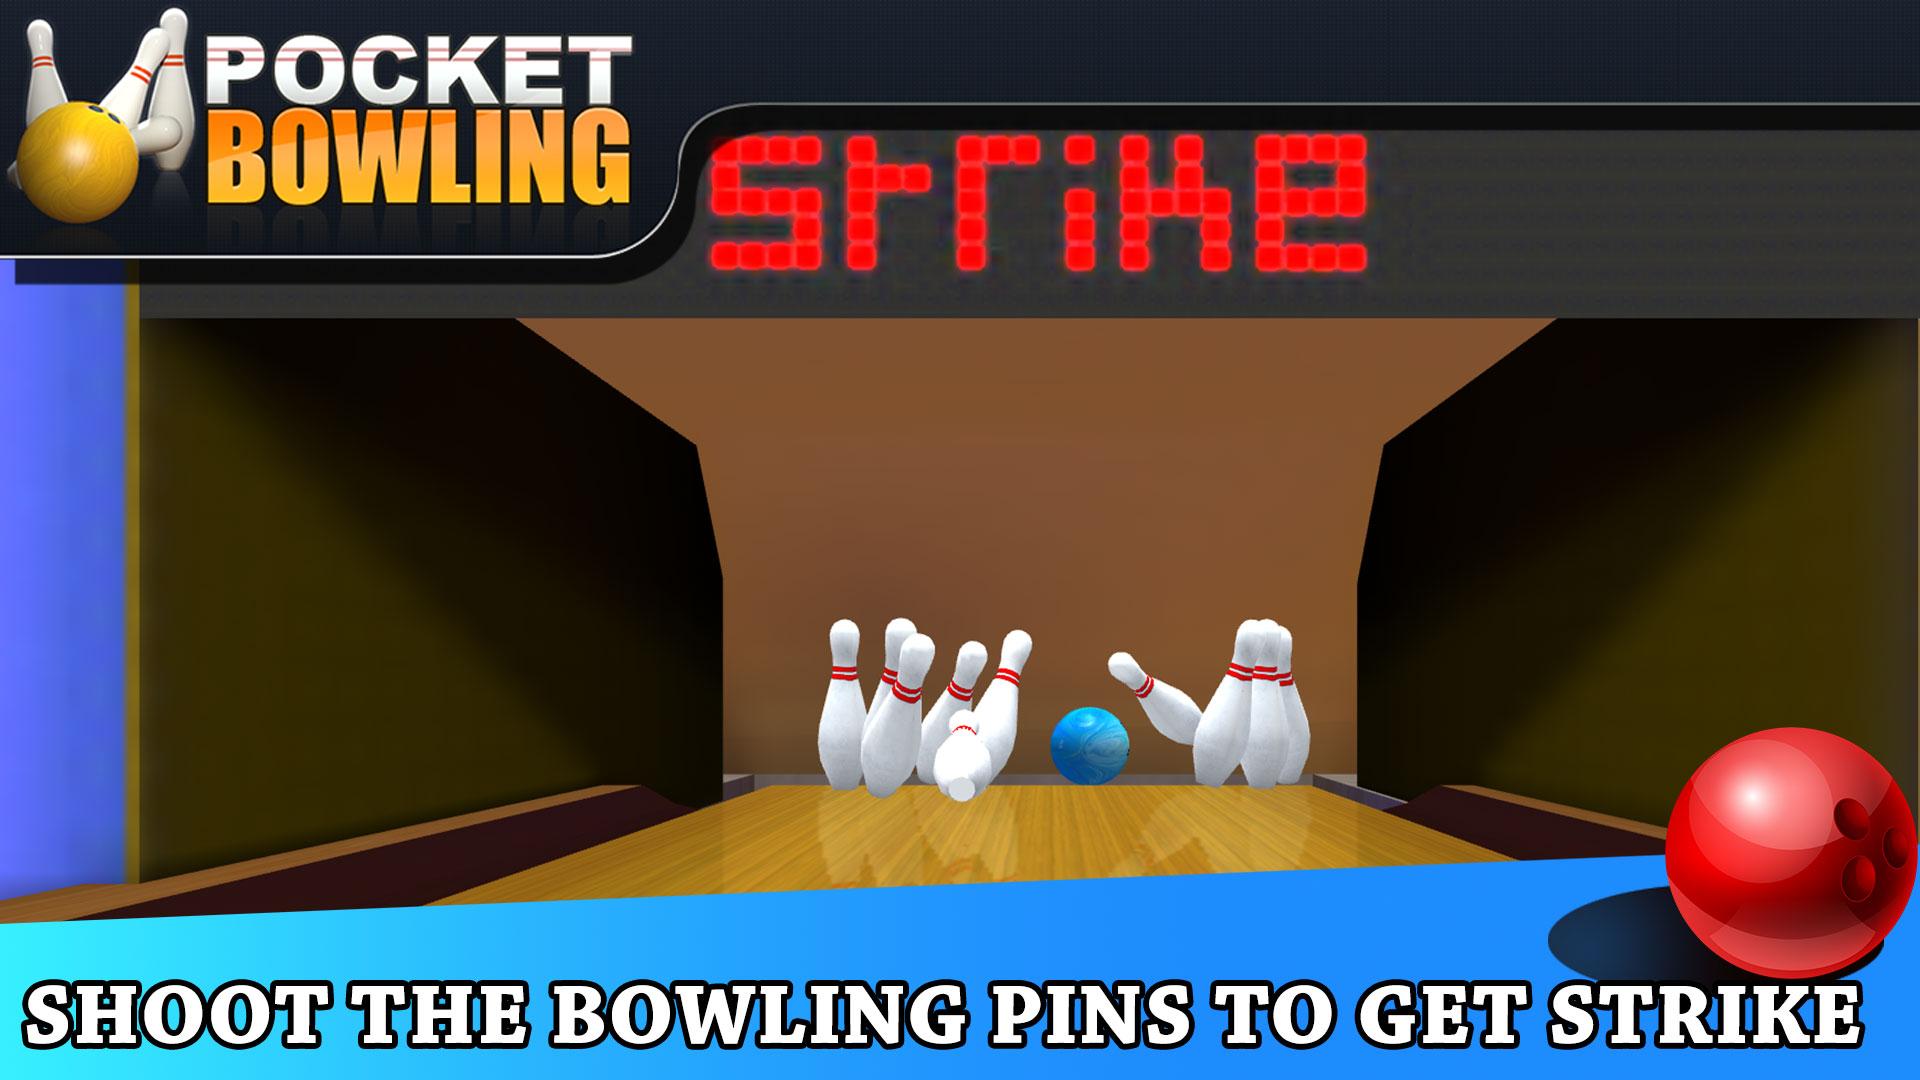 Pocket Bowling 3D for TV screenshot 4